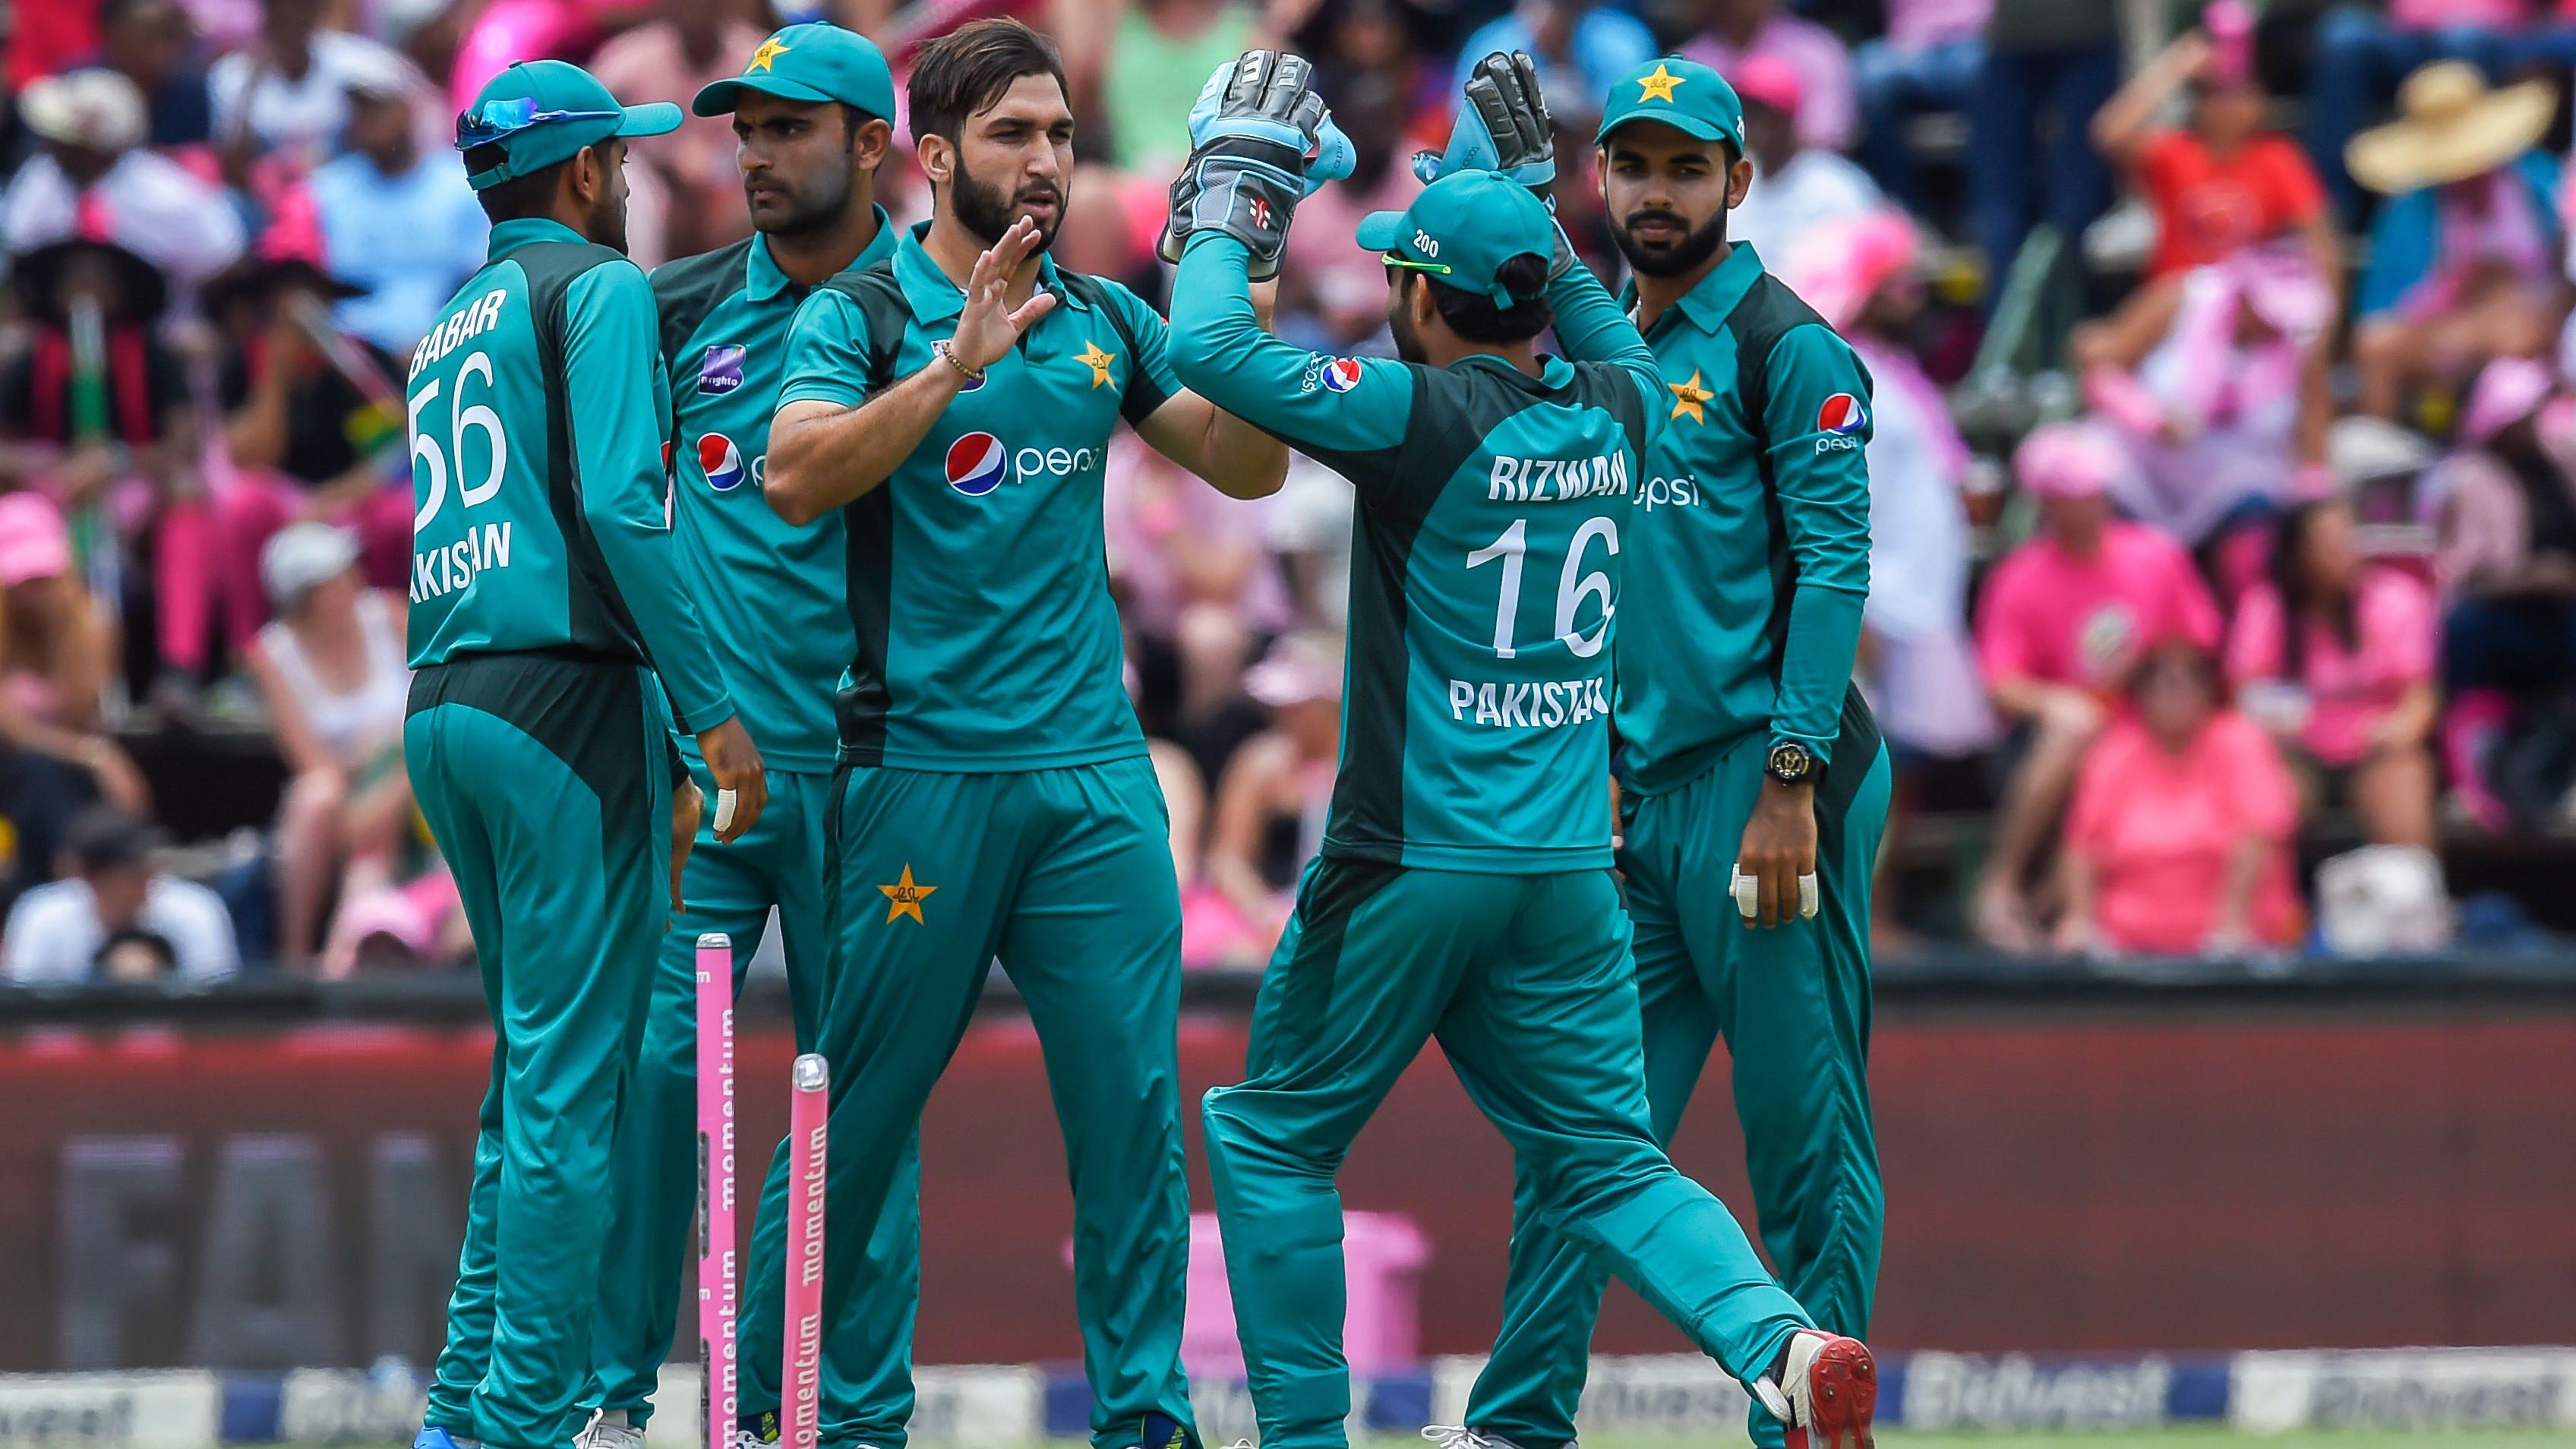 SA v PAK 2018-19 : Fourth ODI - Statistical Highlights